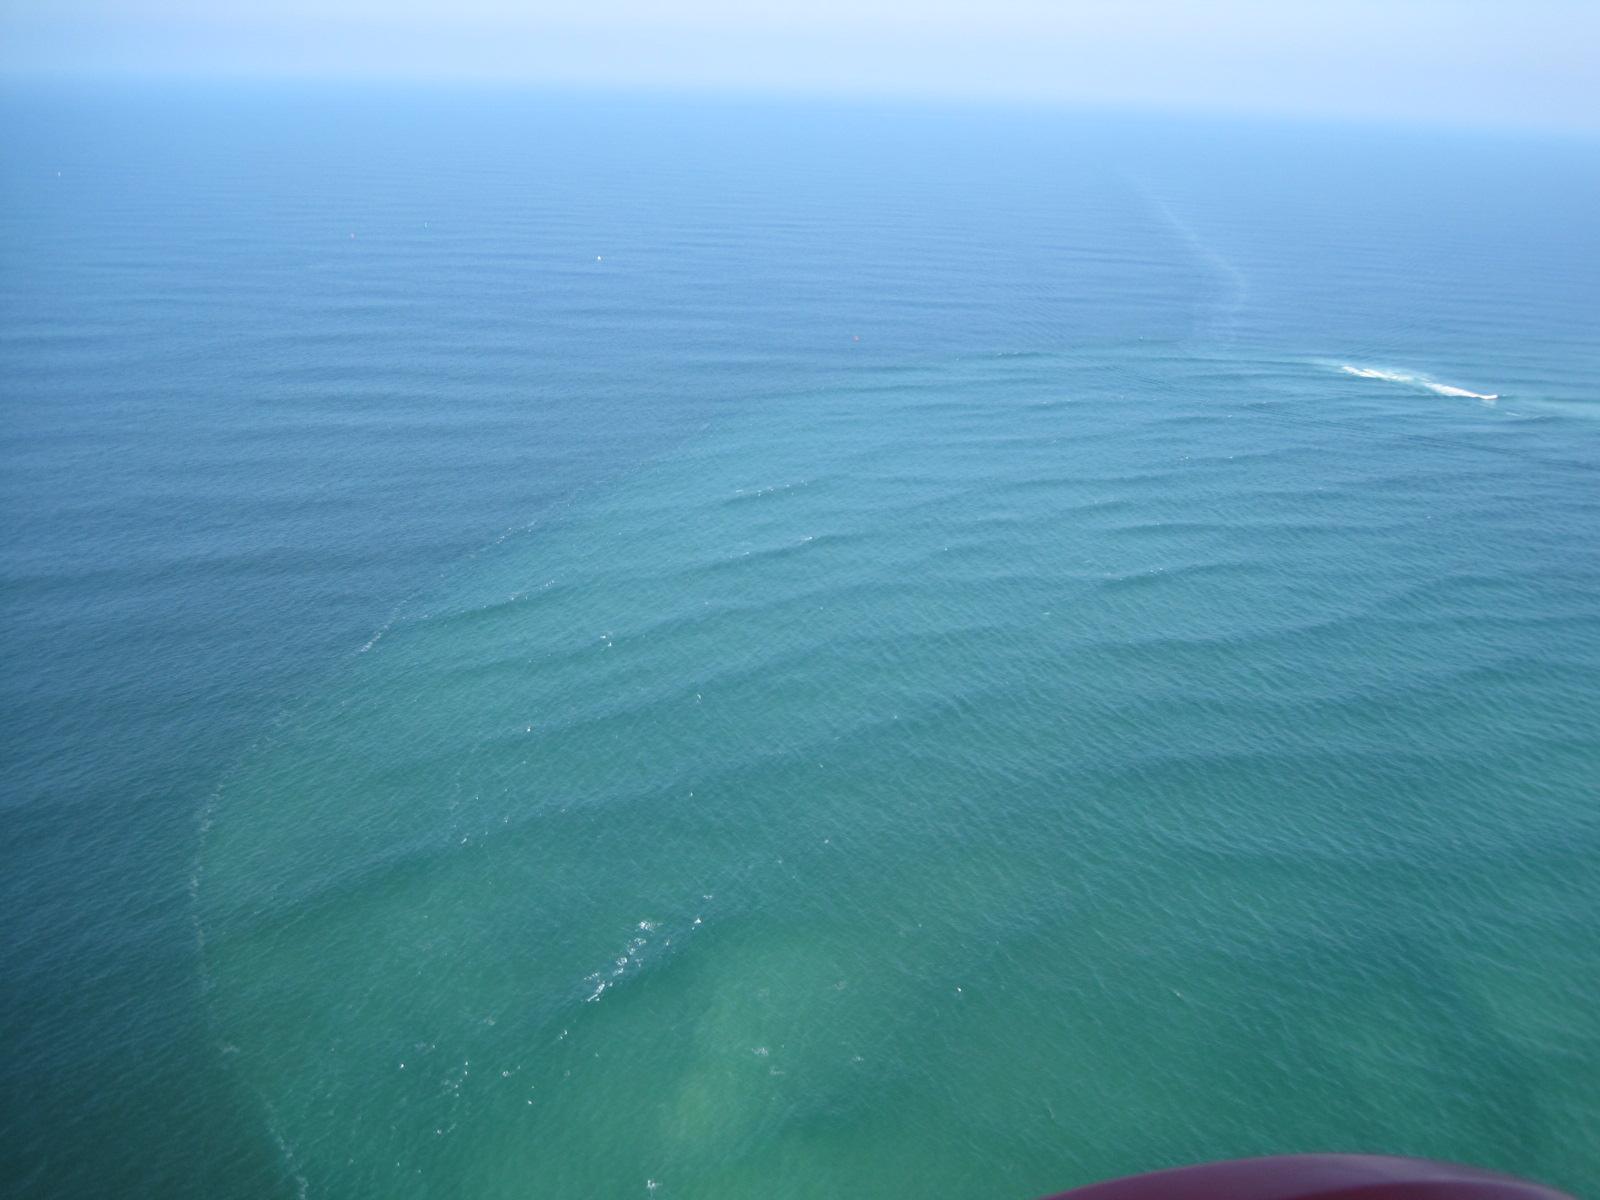 labrador current and gulf stream meet